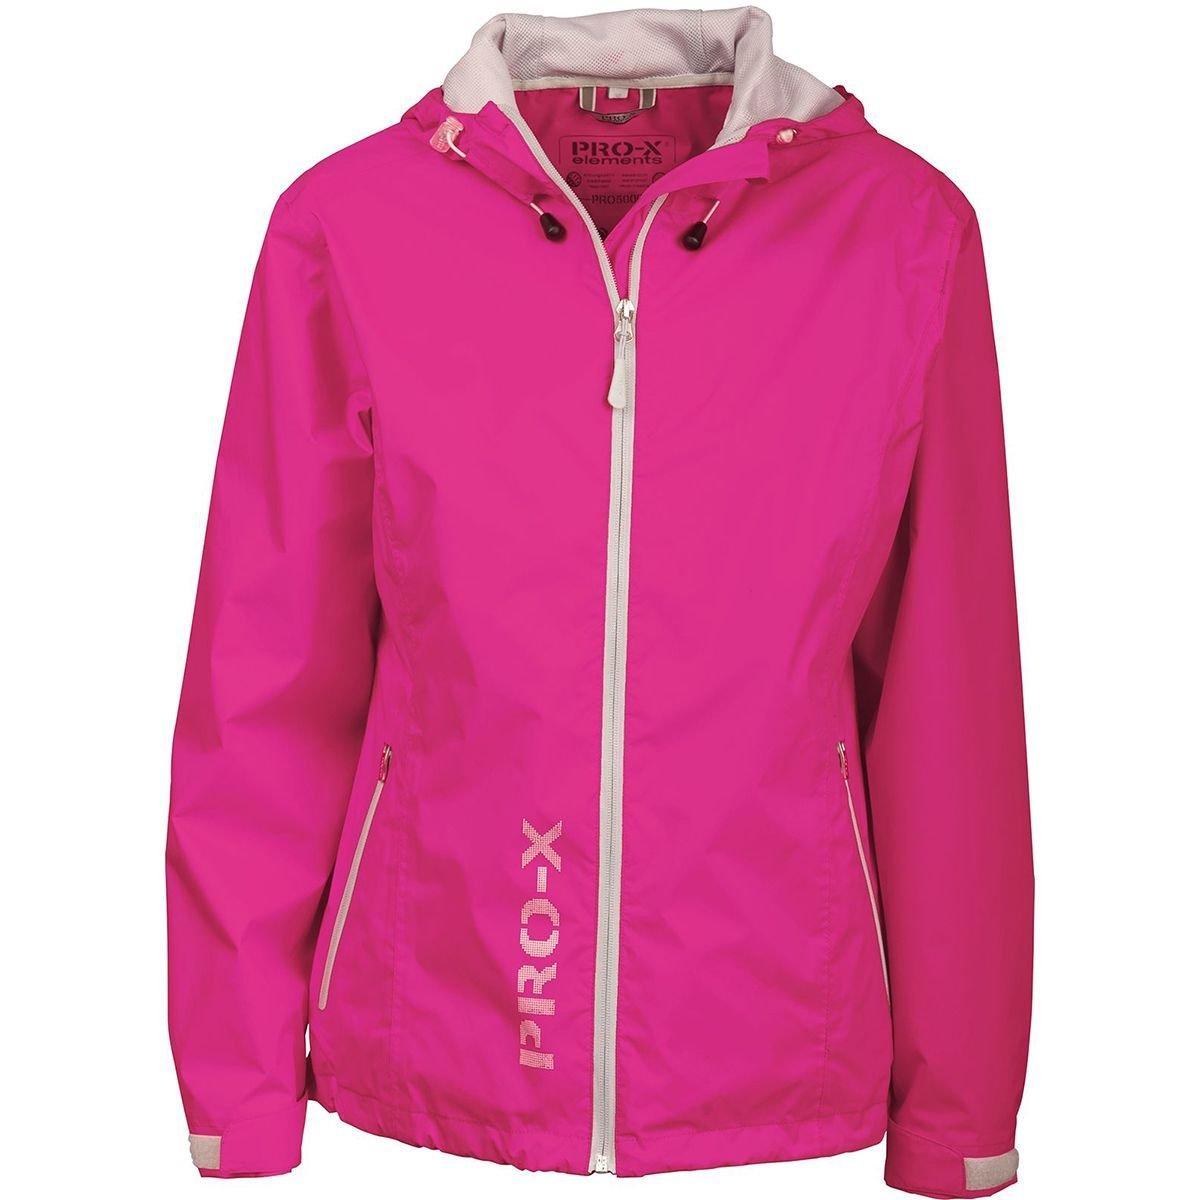 Rose fluorescent Taille 38 PRO-X eleHommests Flash Veste Femme